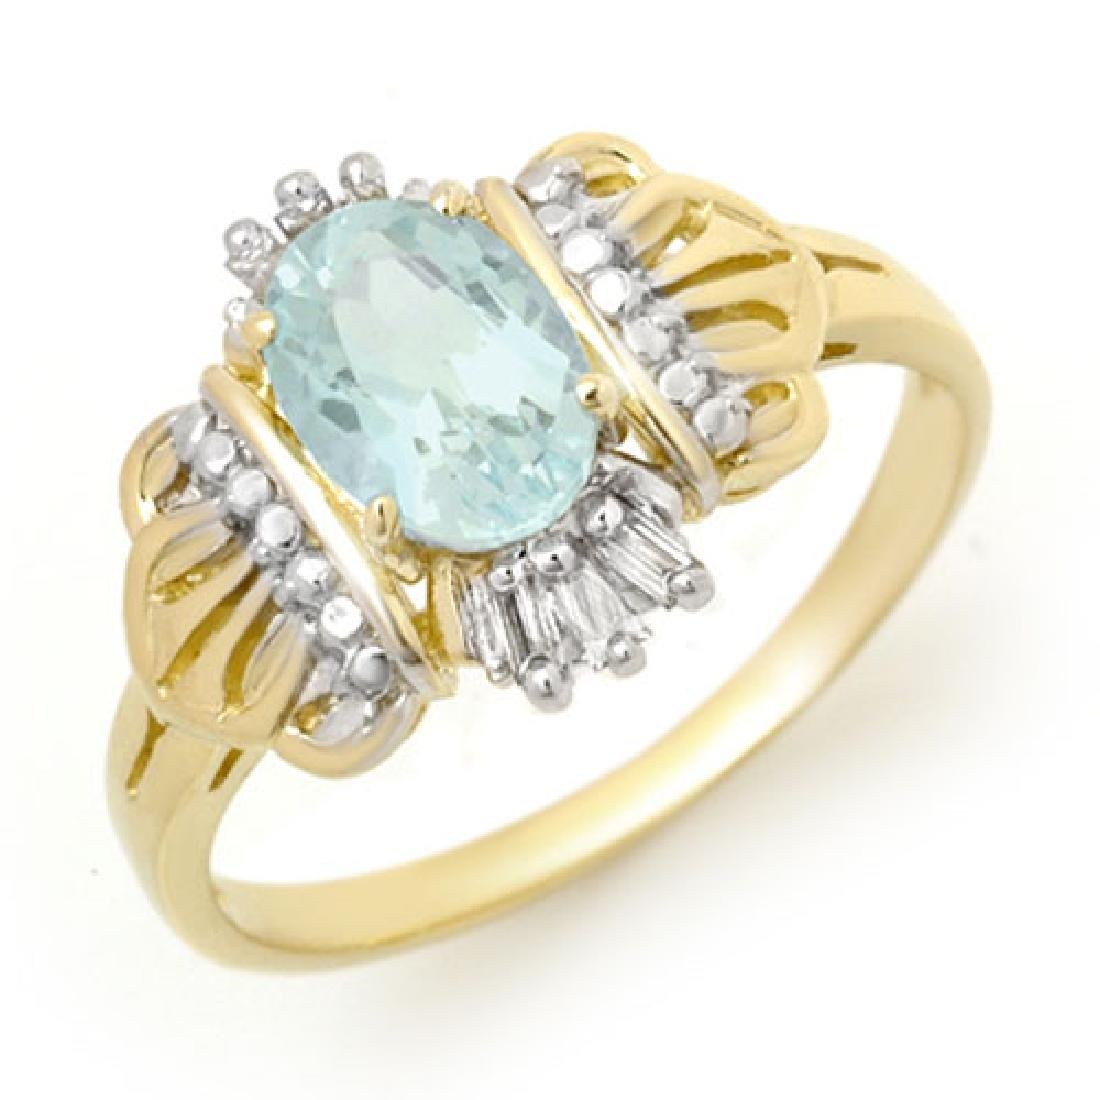 1.05 CTW Aquamarine & Diamond Ring 10K Yellow Gold